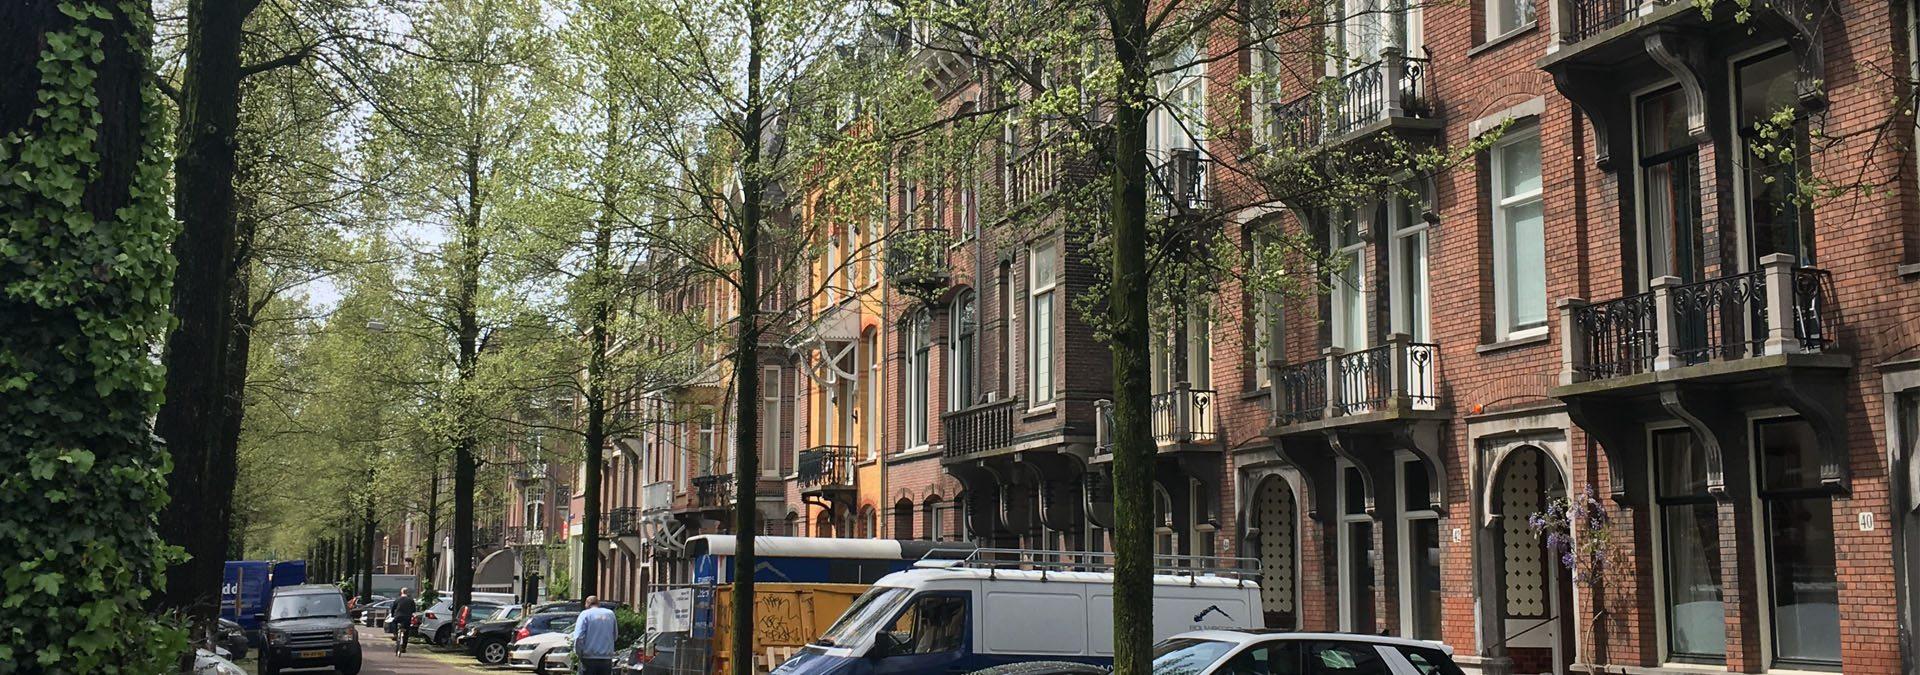 https://www.technea.nl/wp-content/uploads/2018/05/Renovatie-Amsterdam-zuid-vloerverwarming-op-houten-planken.jpg